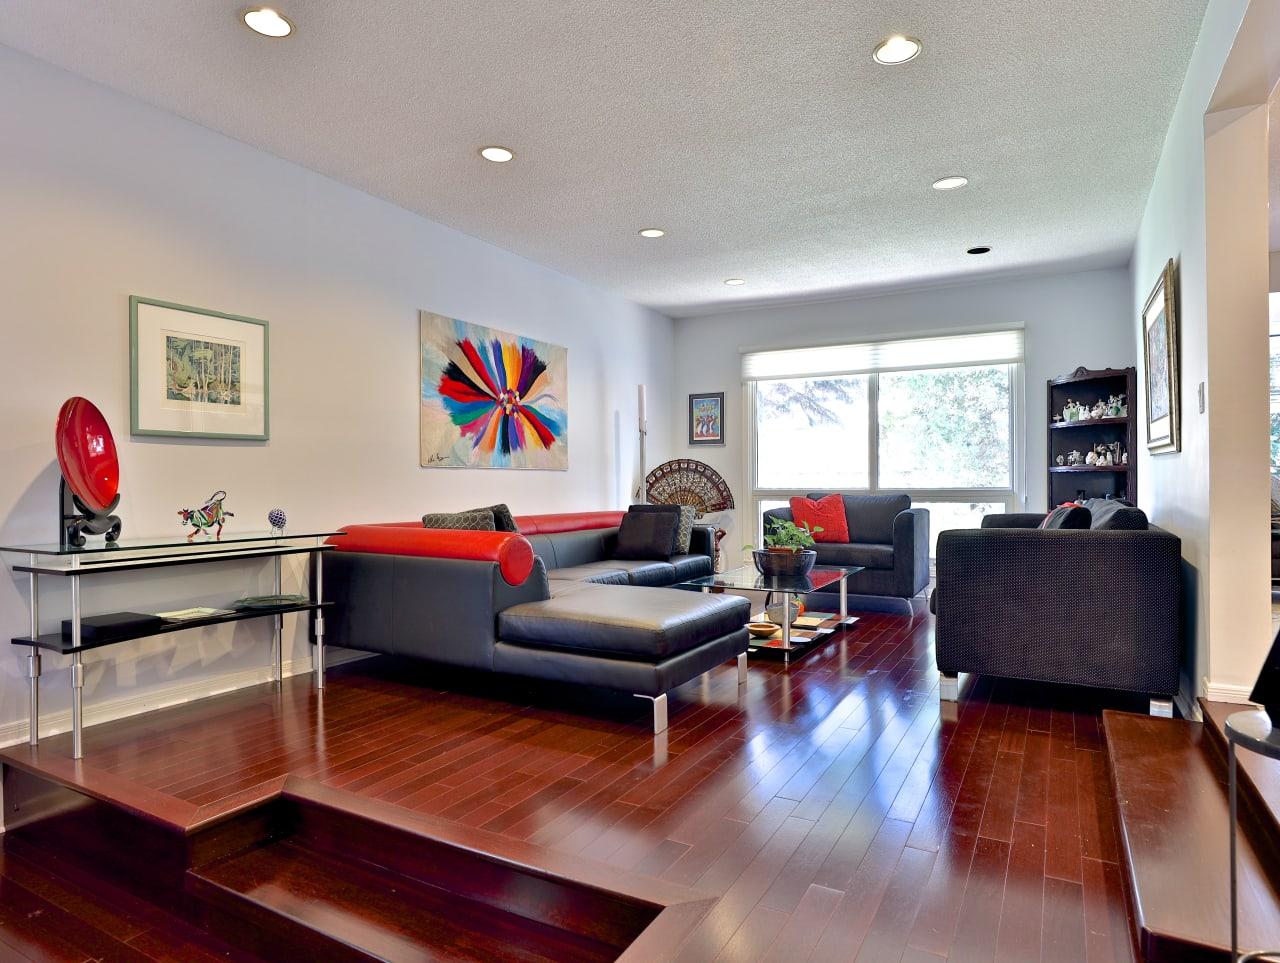 Sold: Wonderful Denlow Family Home